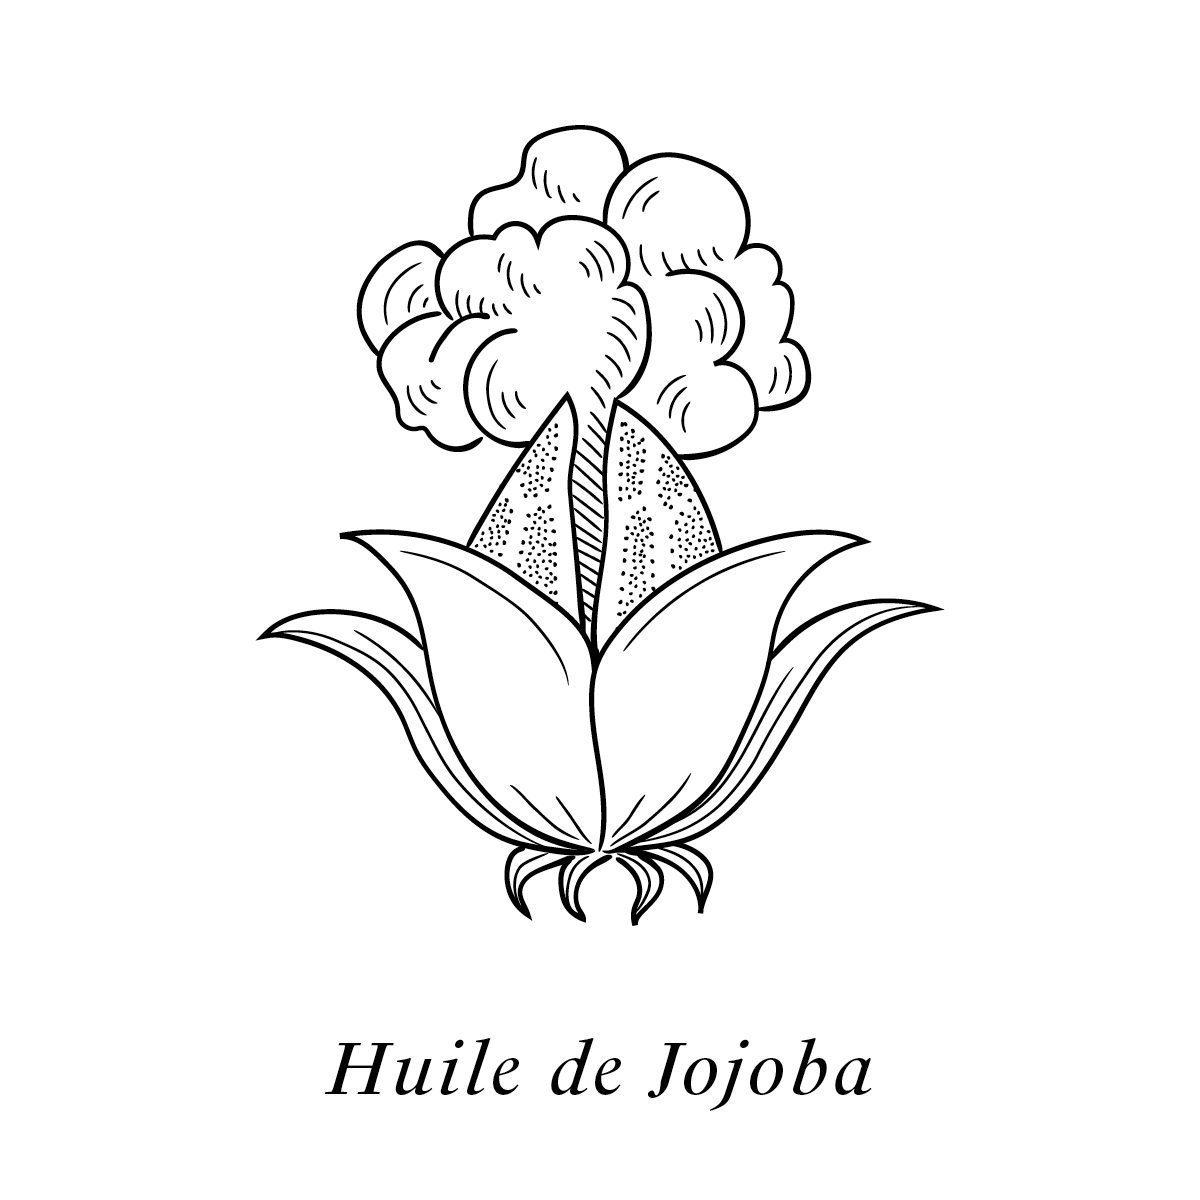 Illustration de l'huile de Jojoba, un des 19 actifs de la crème Claudius N°1, design ichetkar